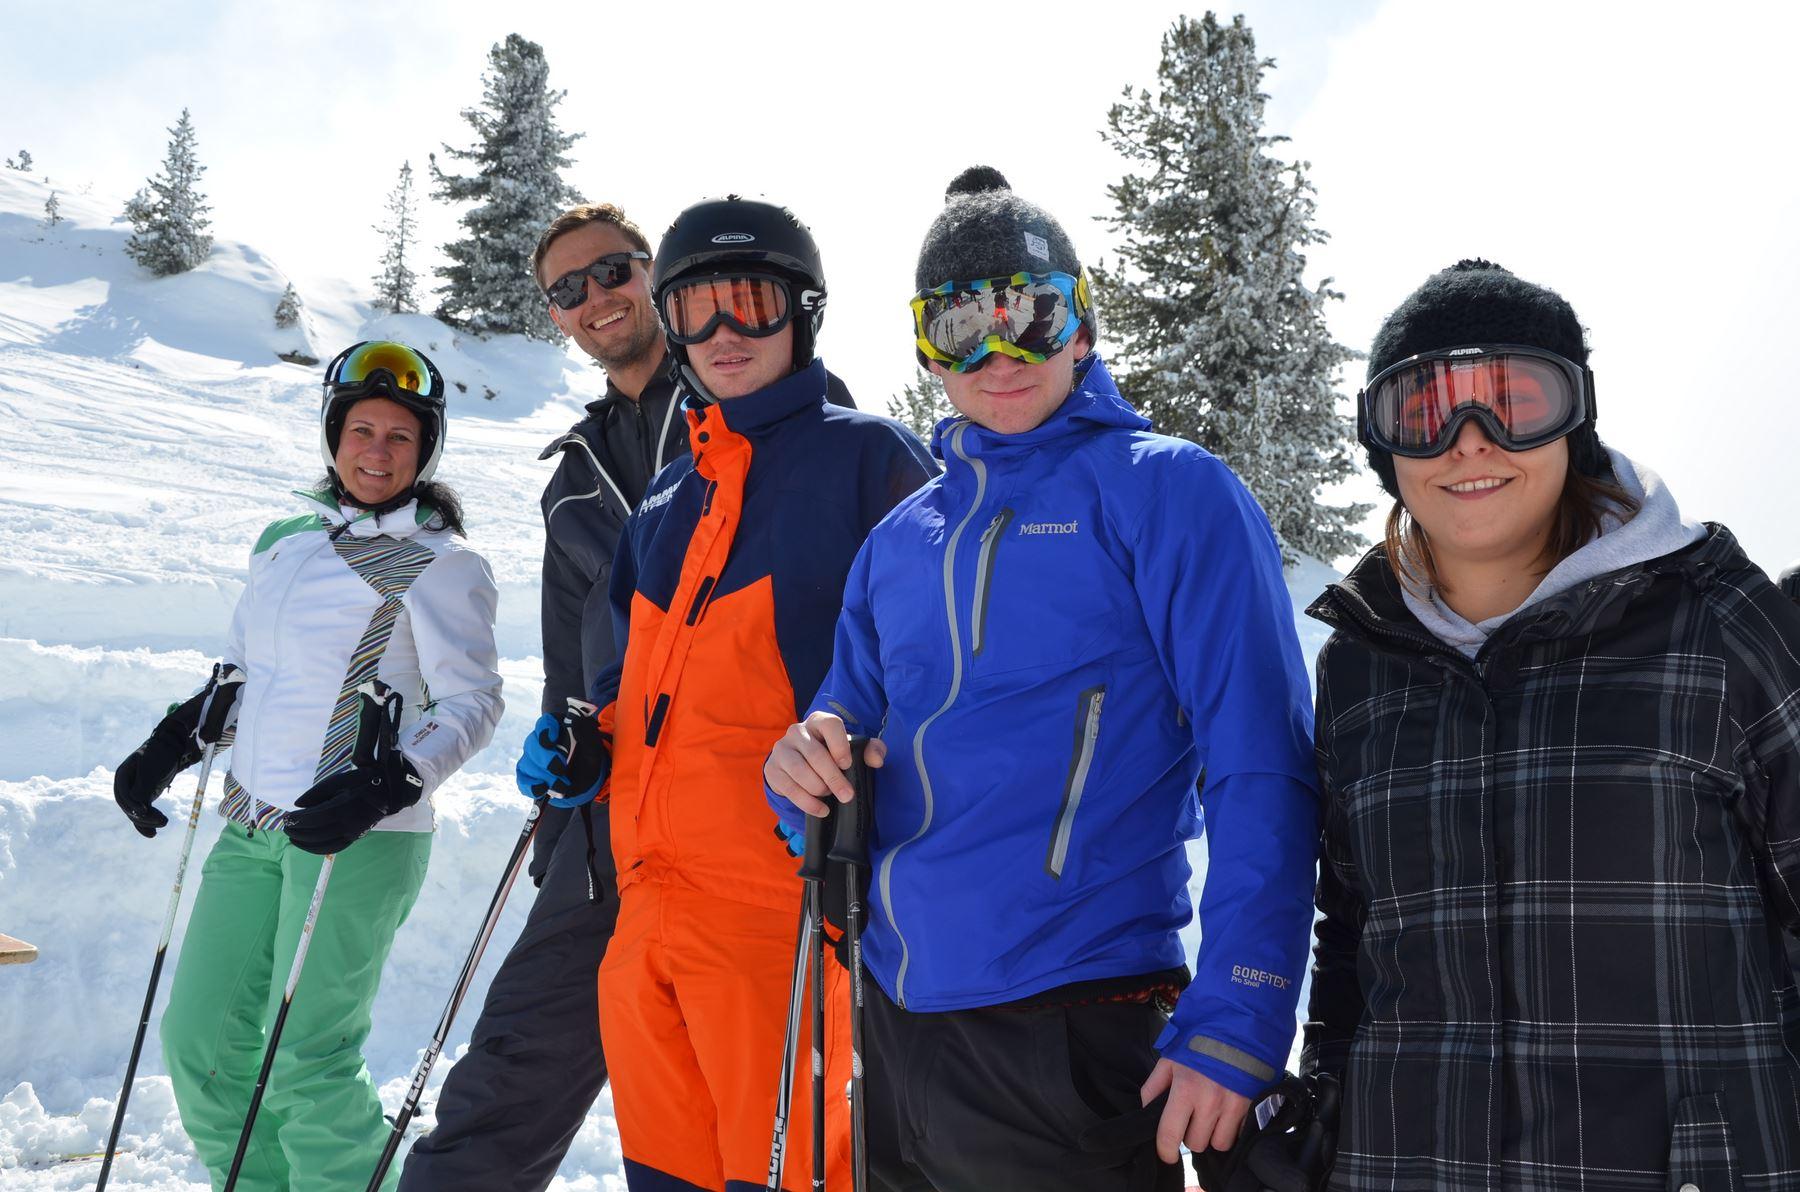 2015-03-22 BV Zillertal Skirennen 289.JPG